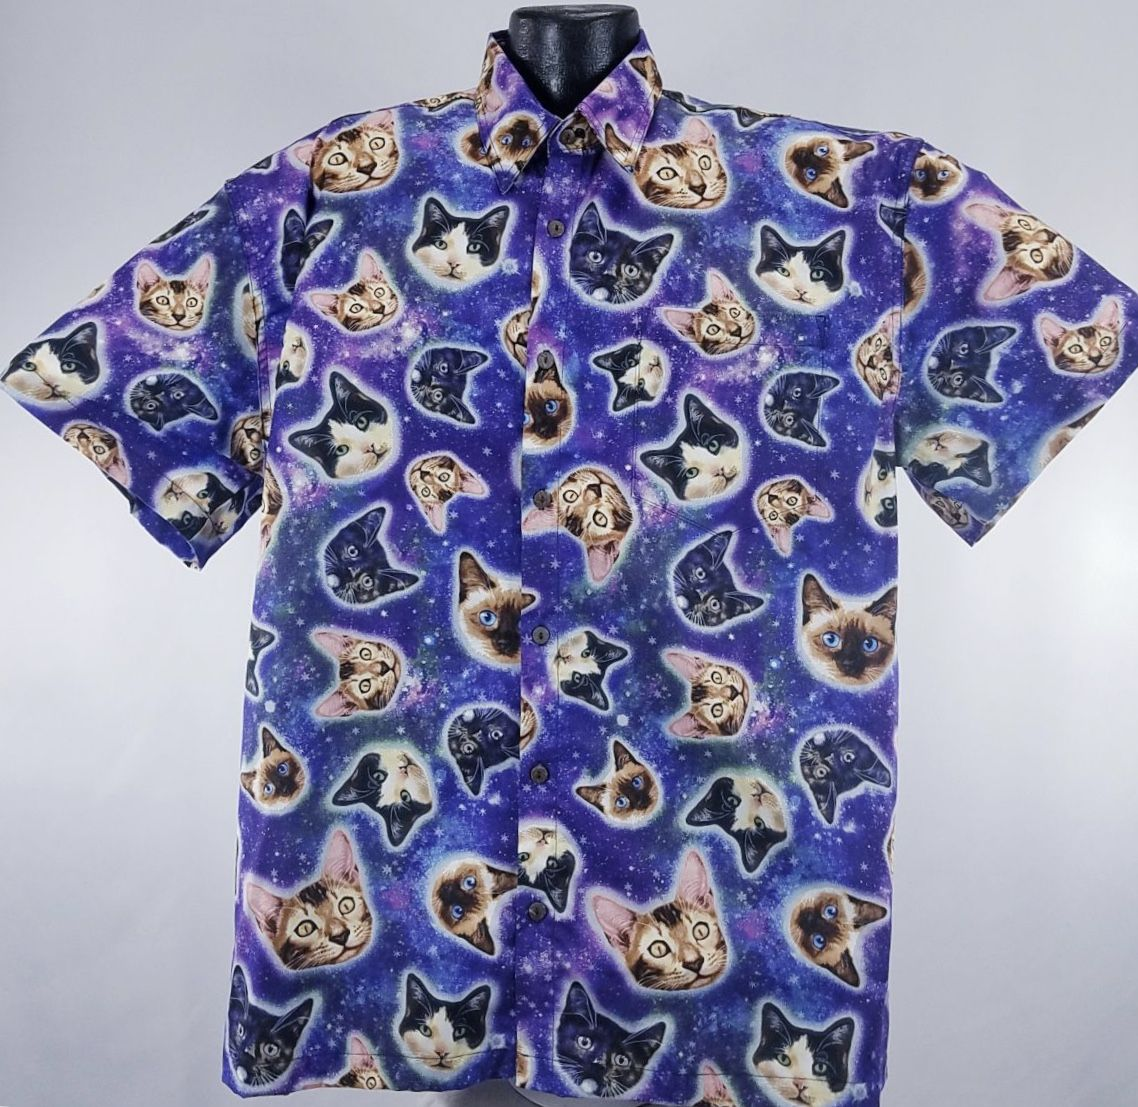 A shirt so quirky it's cool. Hawaiianshirt alohashirt